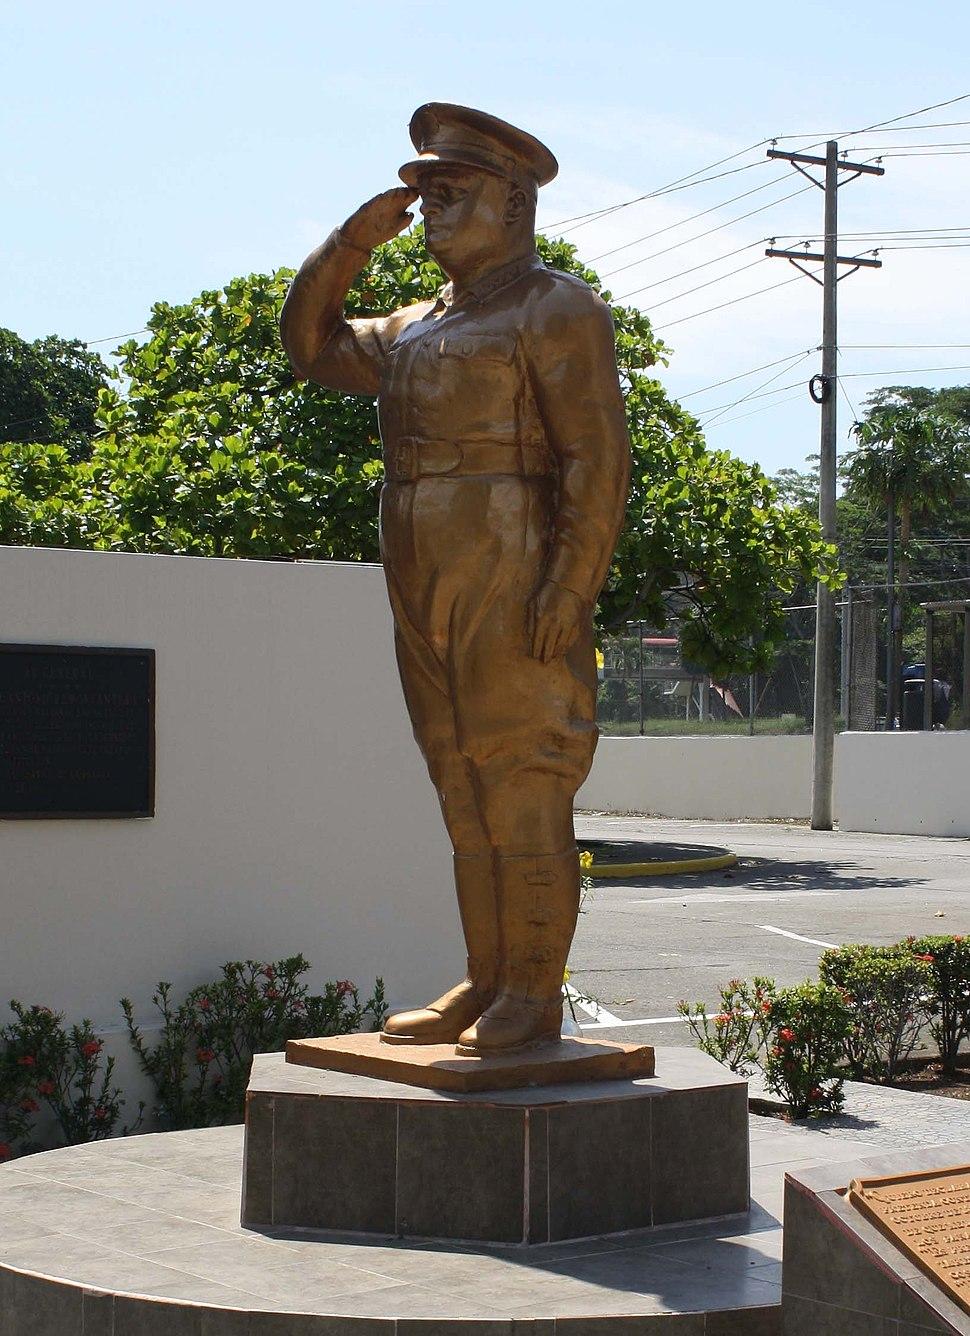 Estatua de Jos%C3%A9 Antonio Rem%C3%B3n Cantera - Sede de la Polic%C3%ADa Nacional de Panam%C3%A1 (2012)